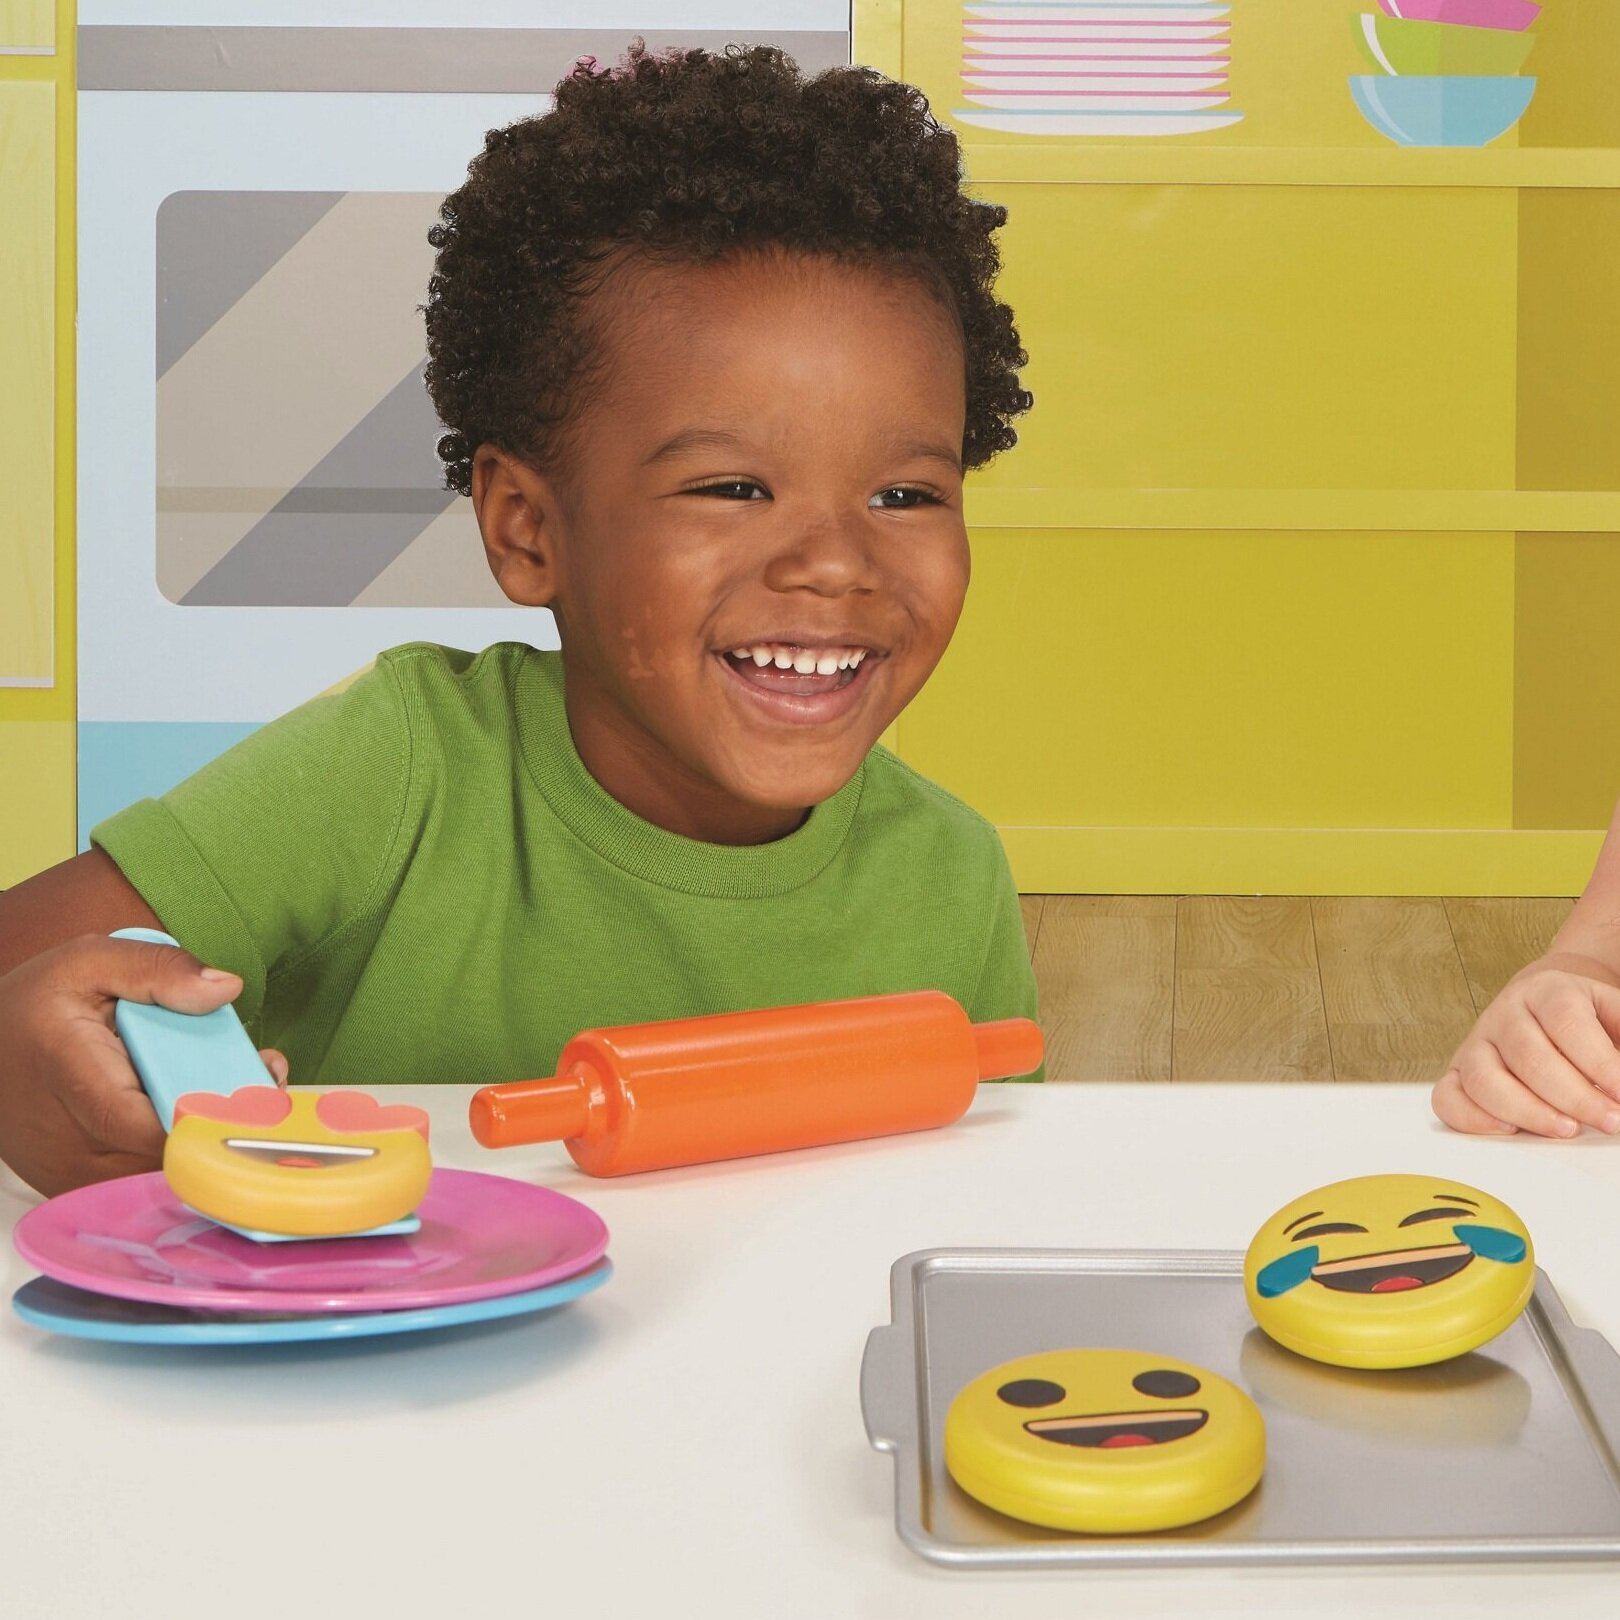 Bake 'n Share Emoji Cookie Set - $14.99